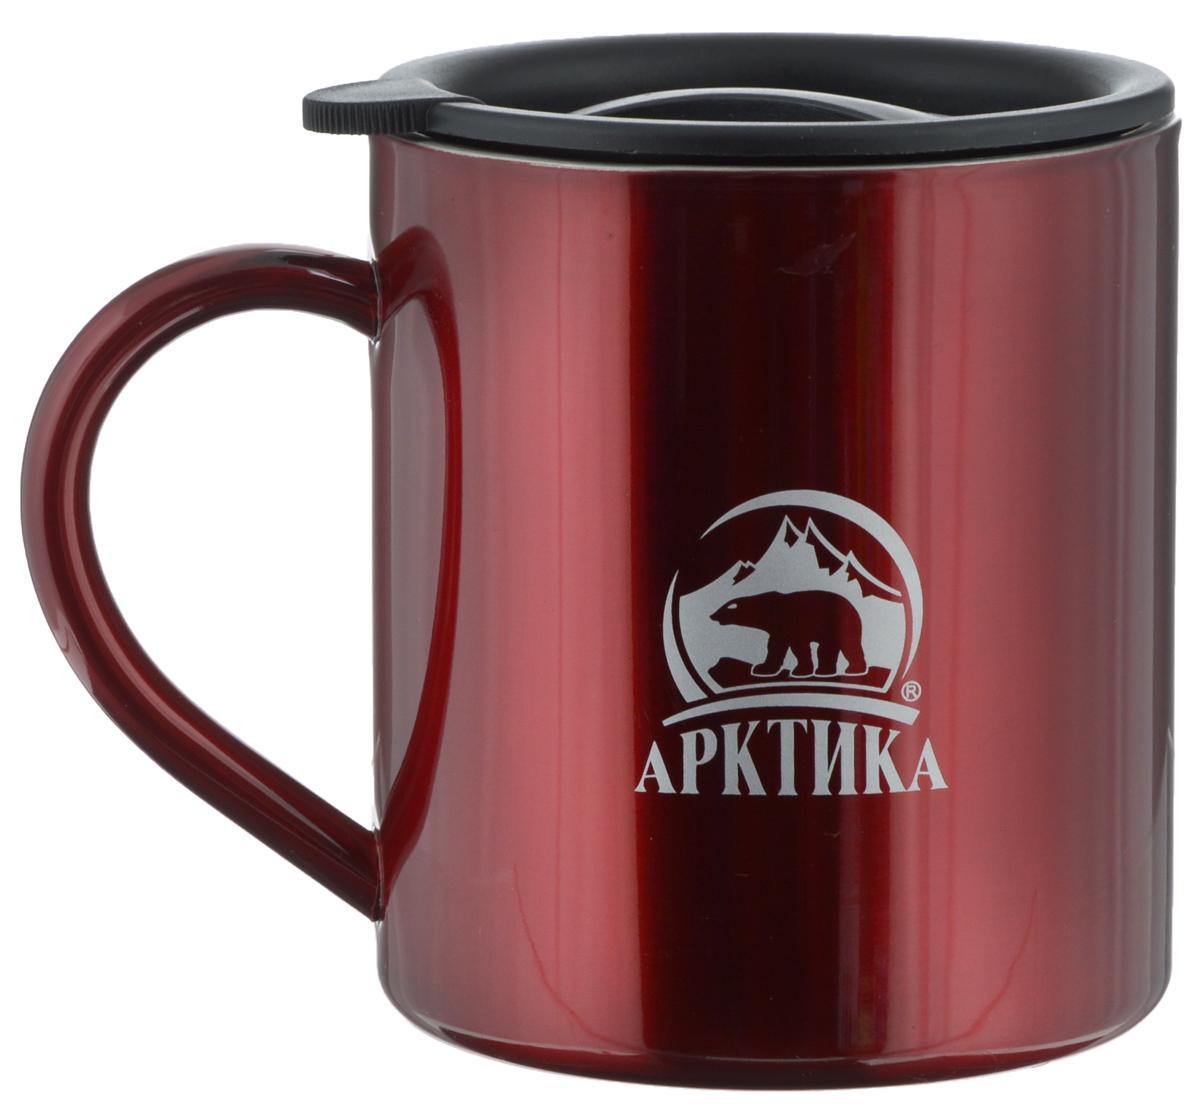 Термокружка Арктика, цвет: красный, 450 мл термокружка экспедиция натуралист 450 мл